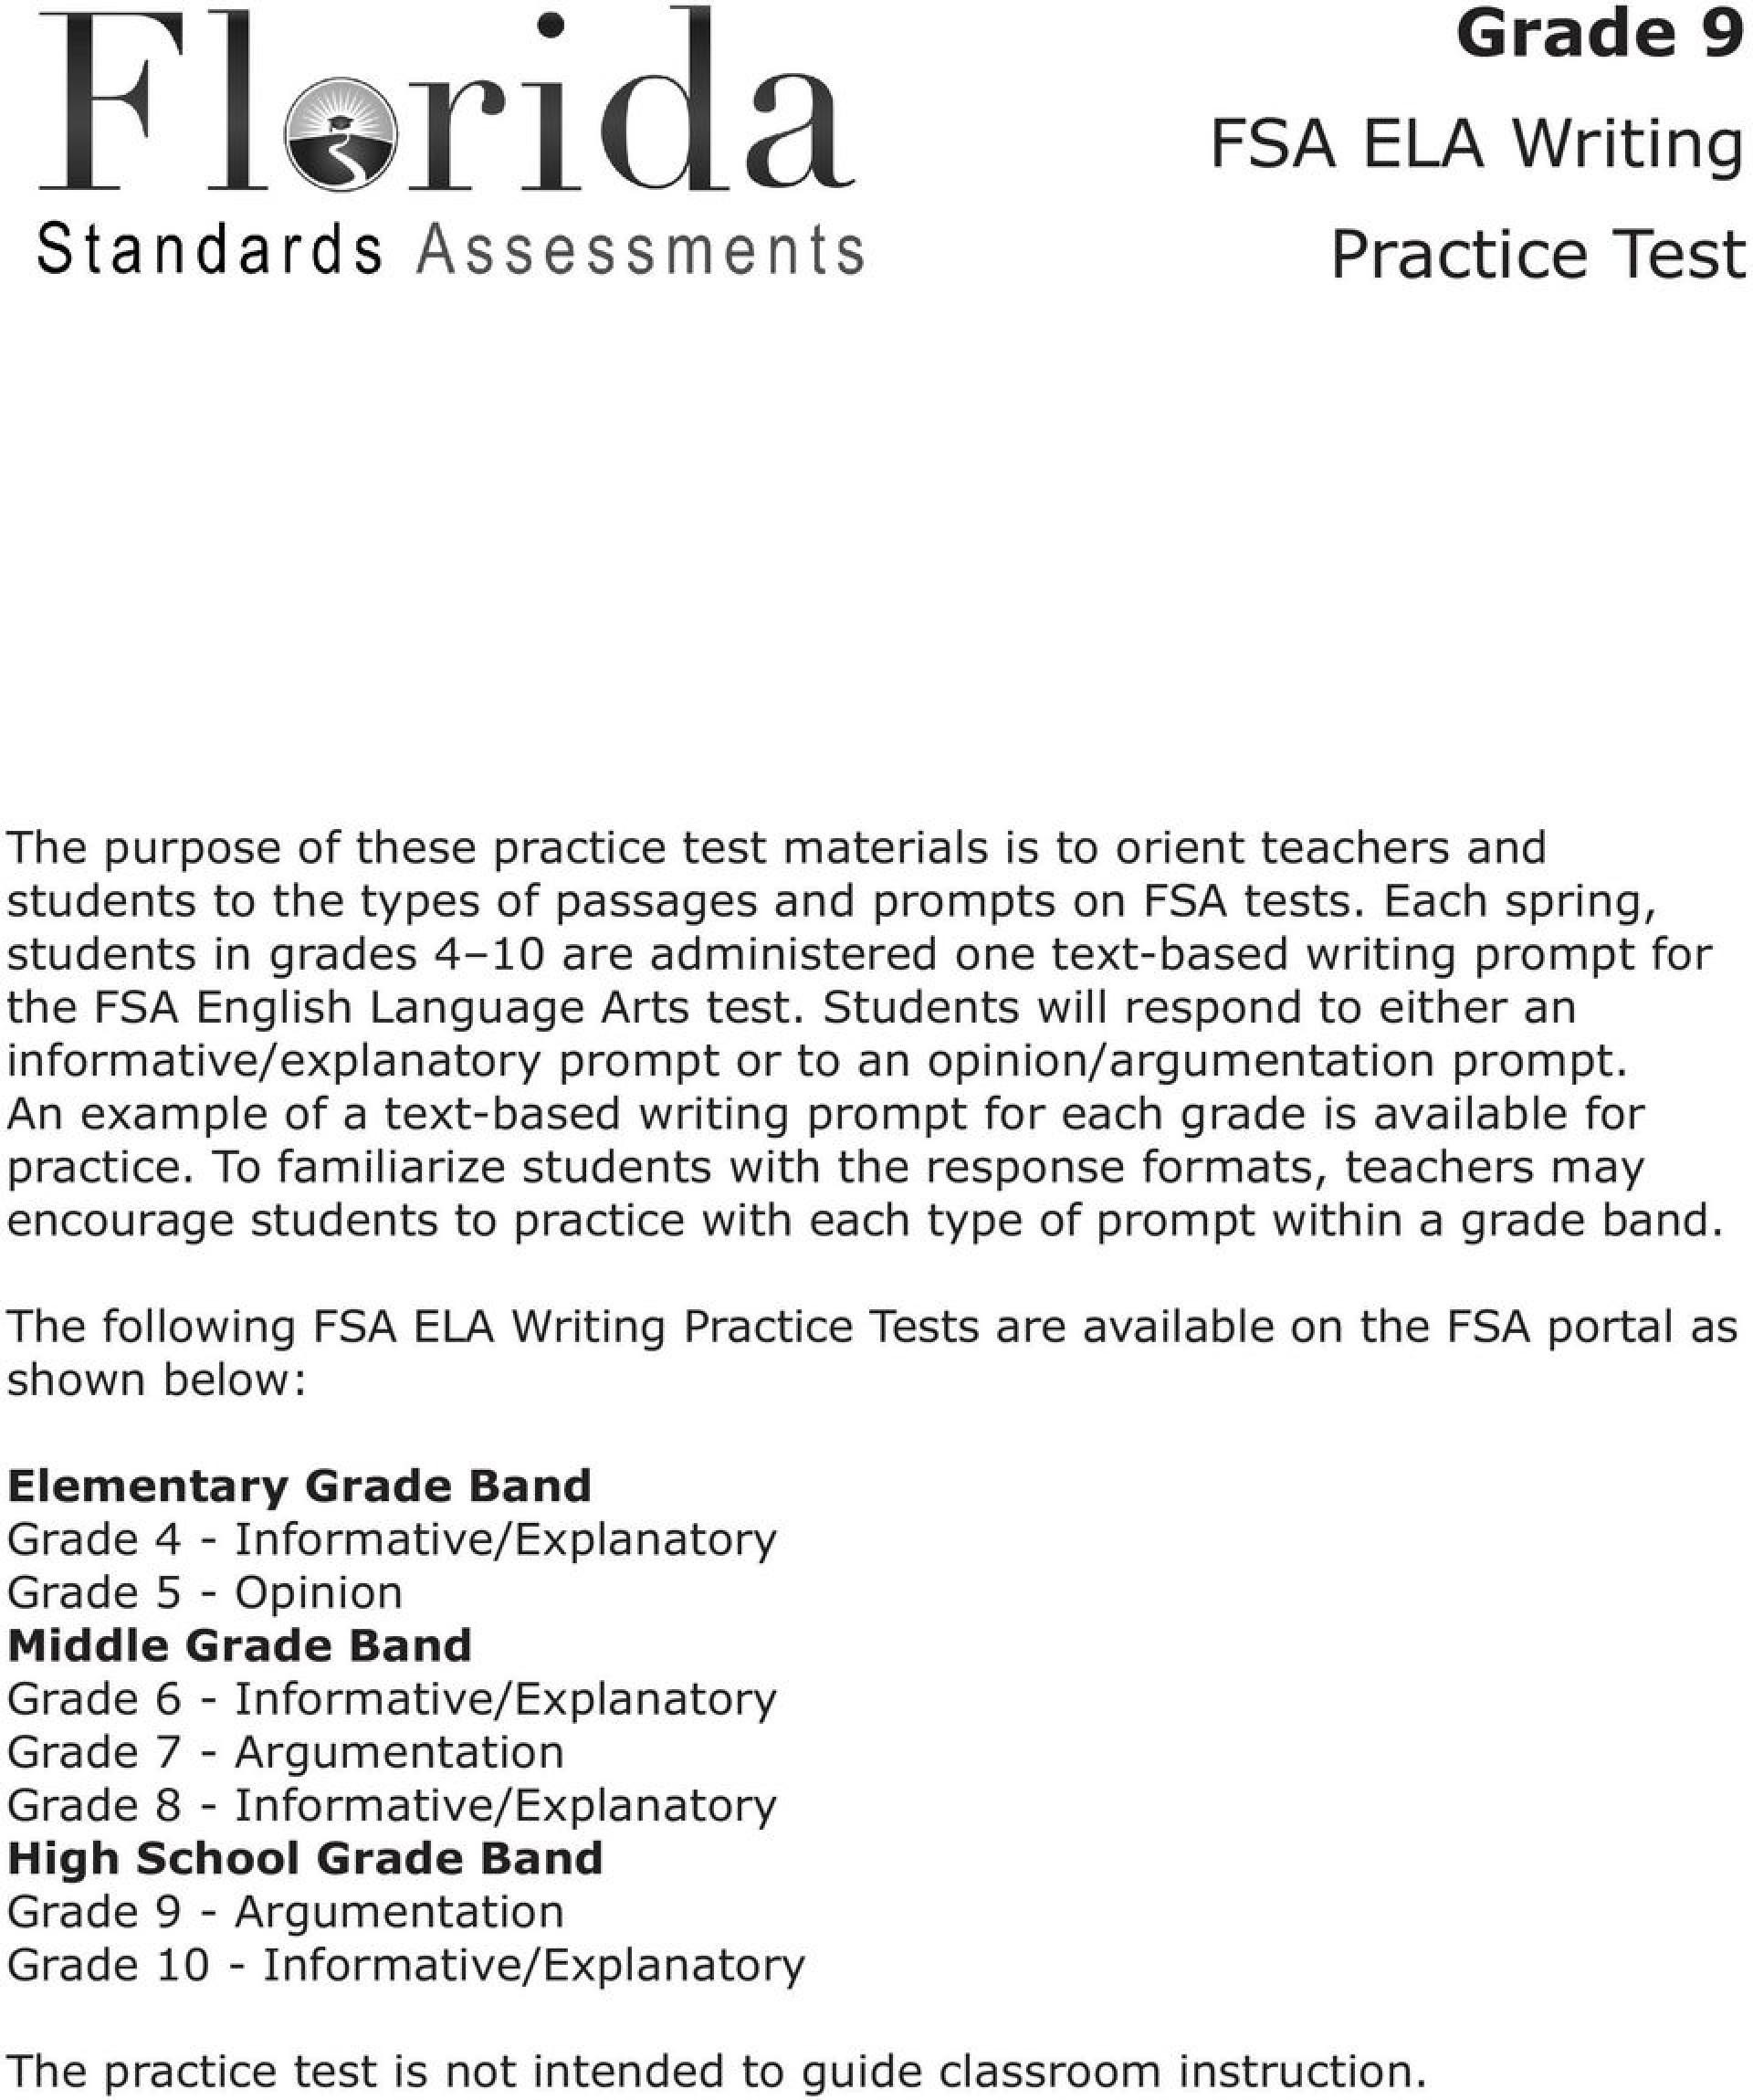 008 Informative Essay Definition Example Grade Fsa Ela Writing Practice Test Pdf Examples P Argumentative Outstanding 1920